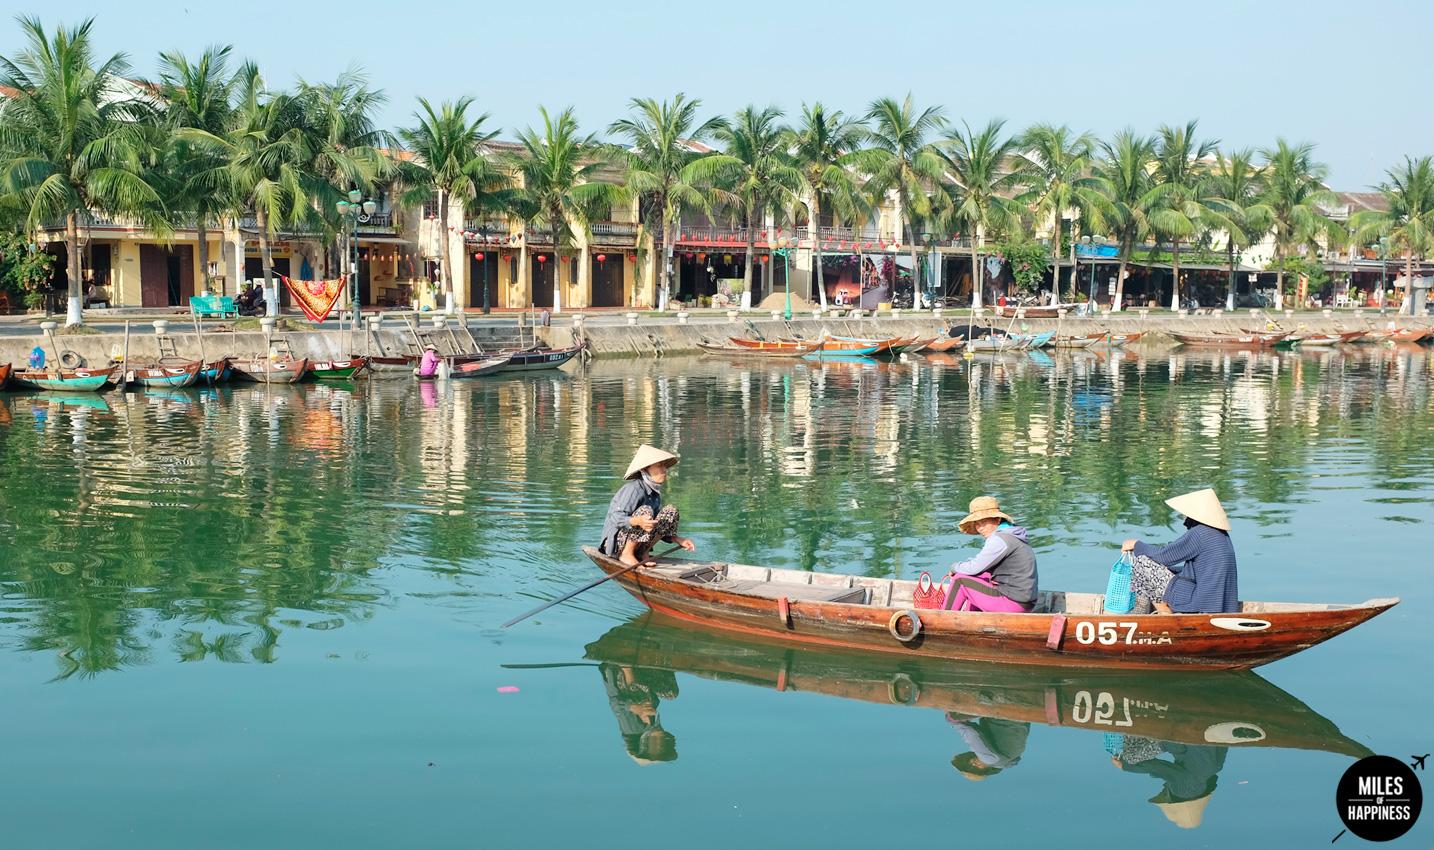 Discover vietnam - hoi an, phan rang, cu chi, saigon, mekong delta